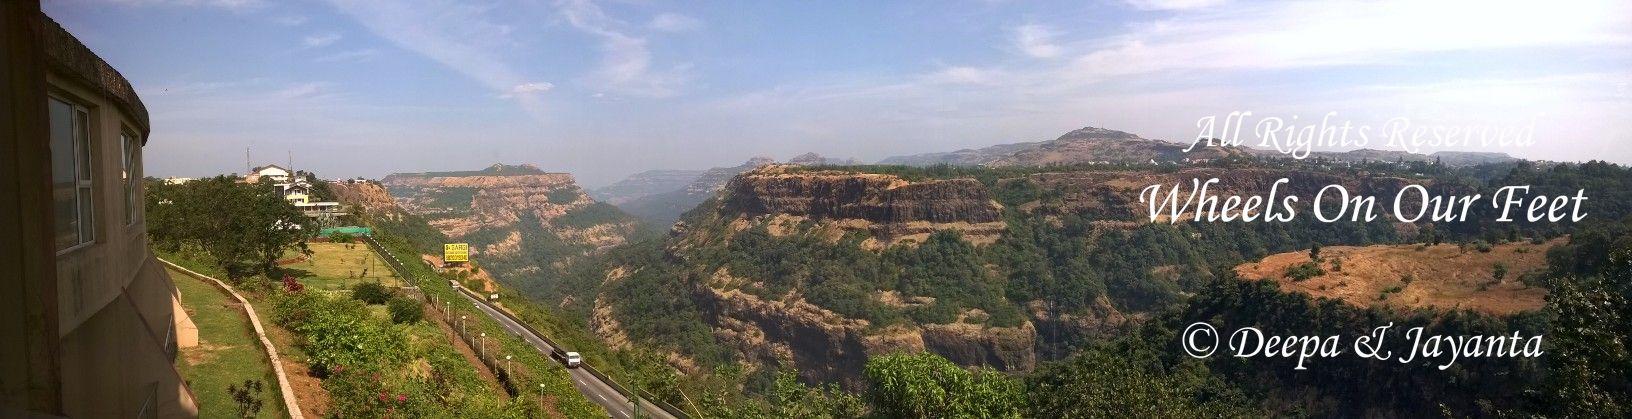 Review: Dukes Retreat in Khandala, India